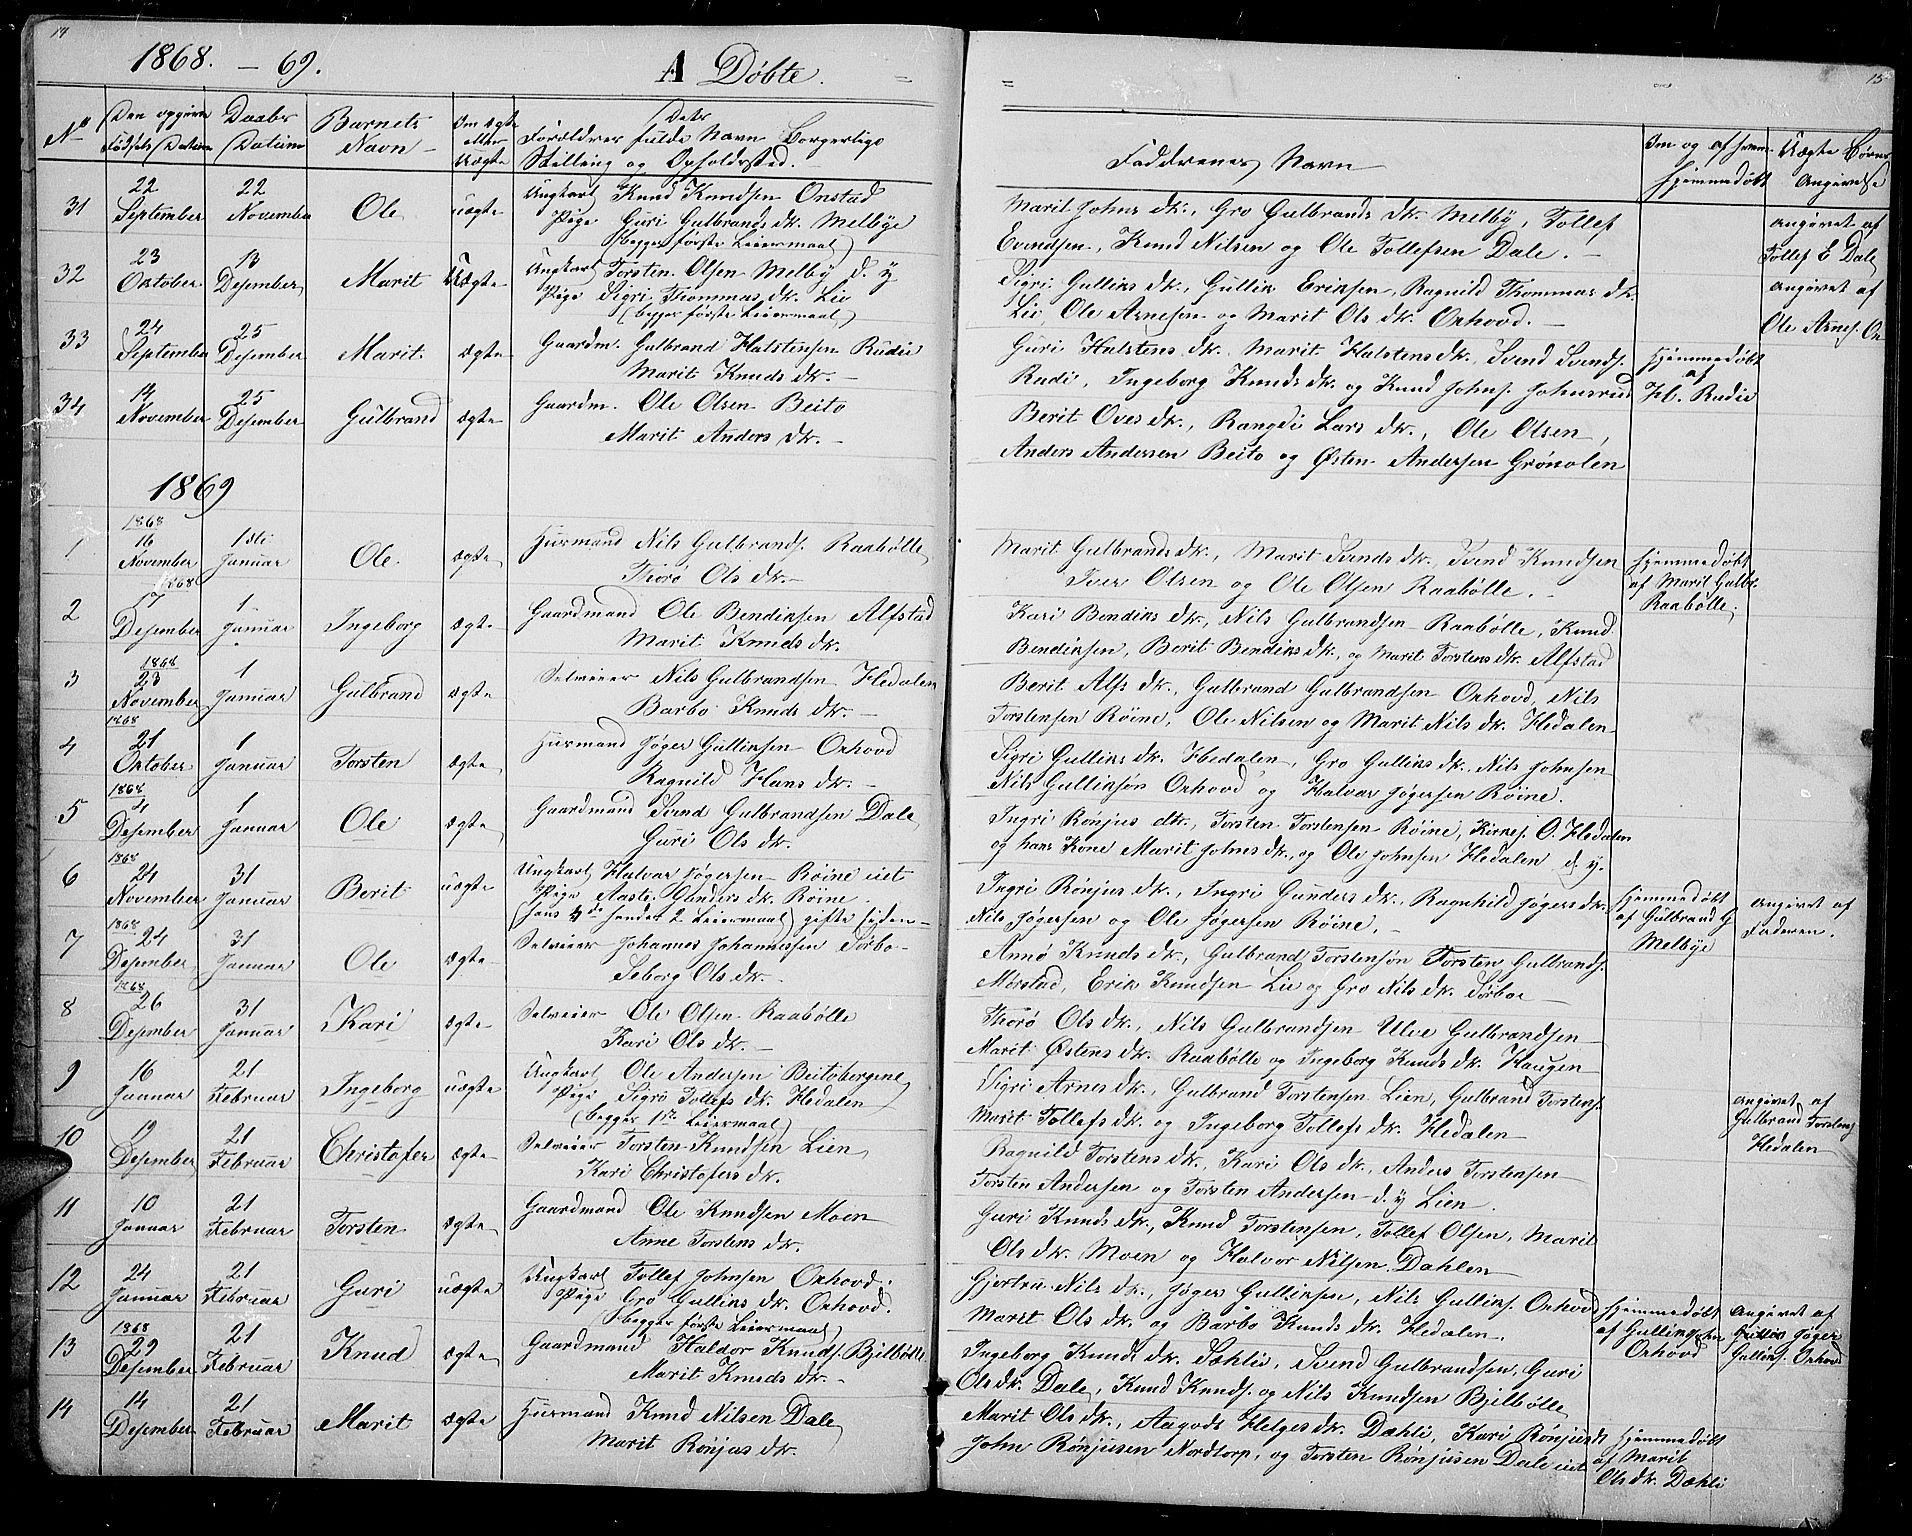 SAH, Øystre Slidre prestekontor, Klokkerbok nr. 1, 1866-1886, s. 14-15